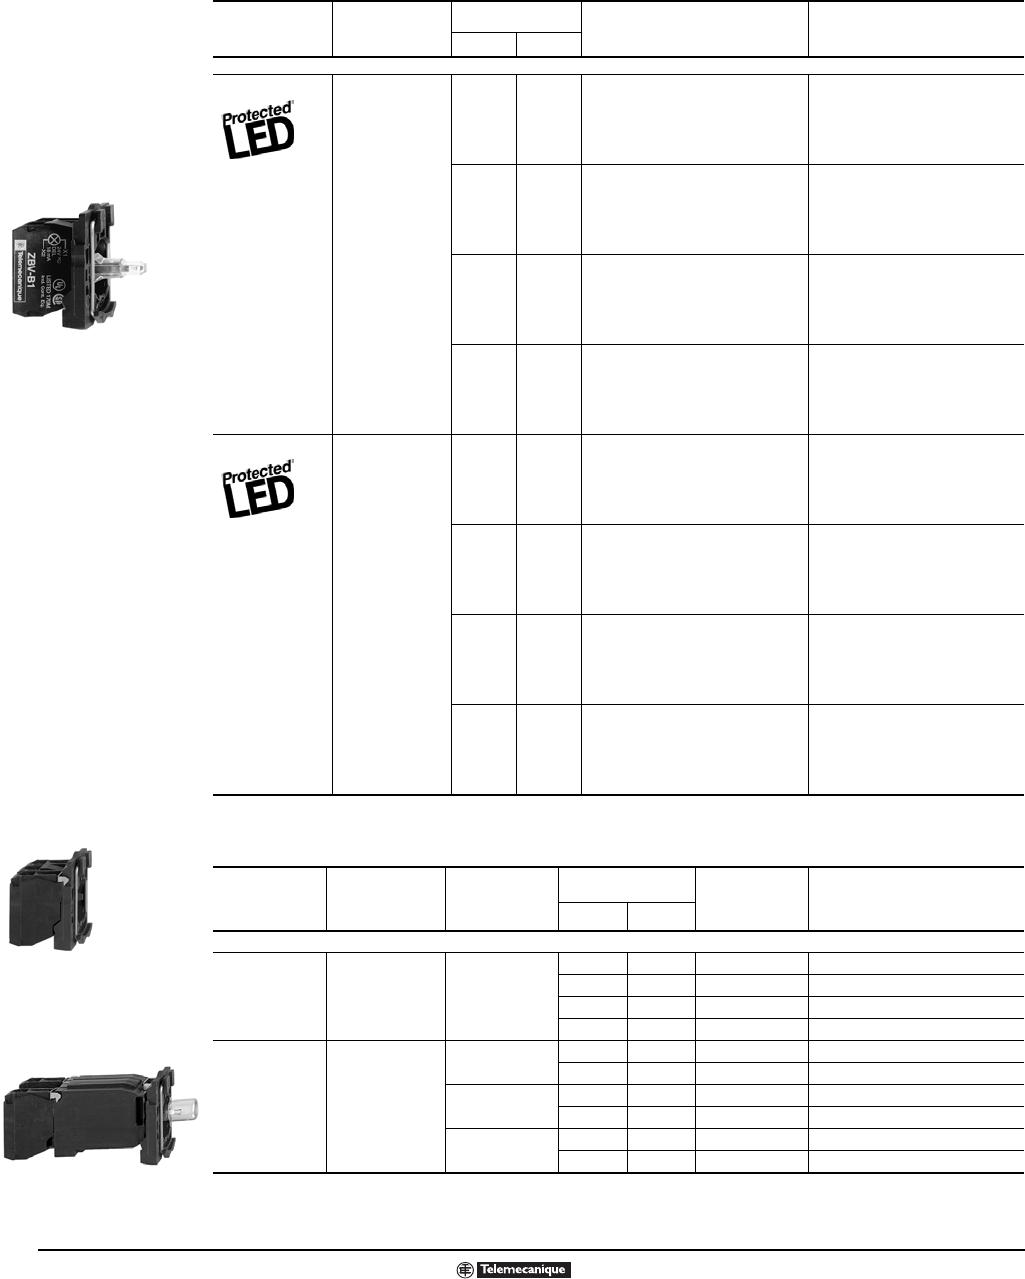 9001ct0001 1000508696 Catalog Rocker Switch Diagram 28emtd 30 Amp Toggle 92